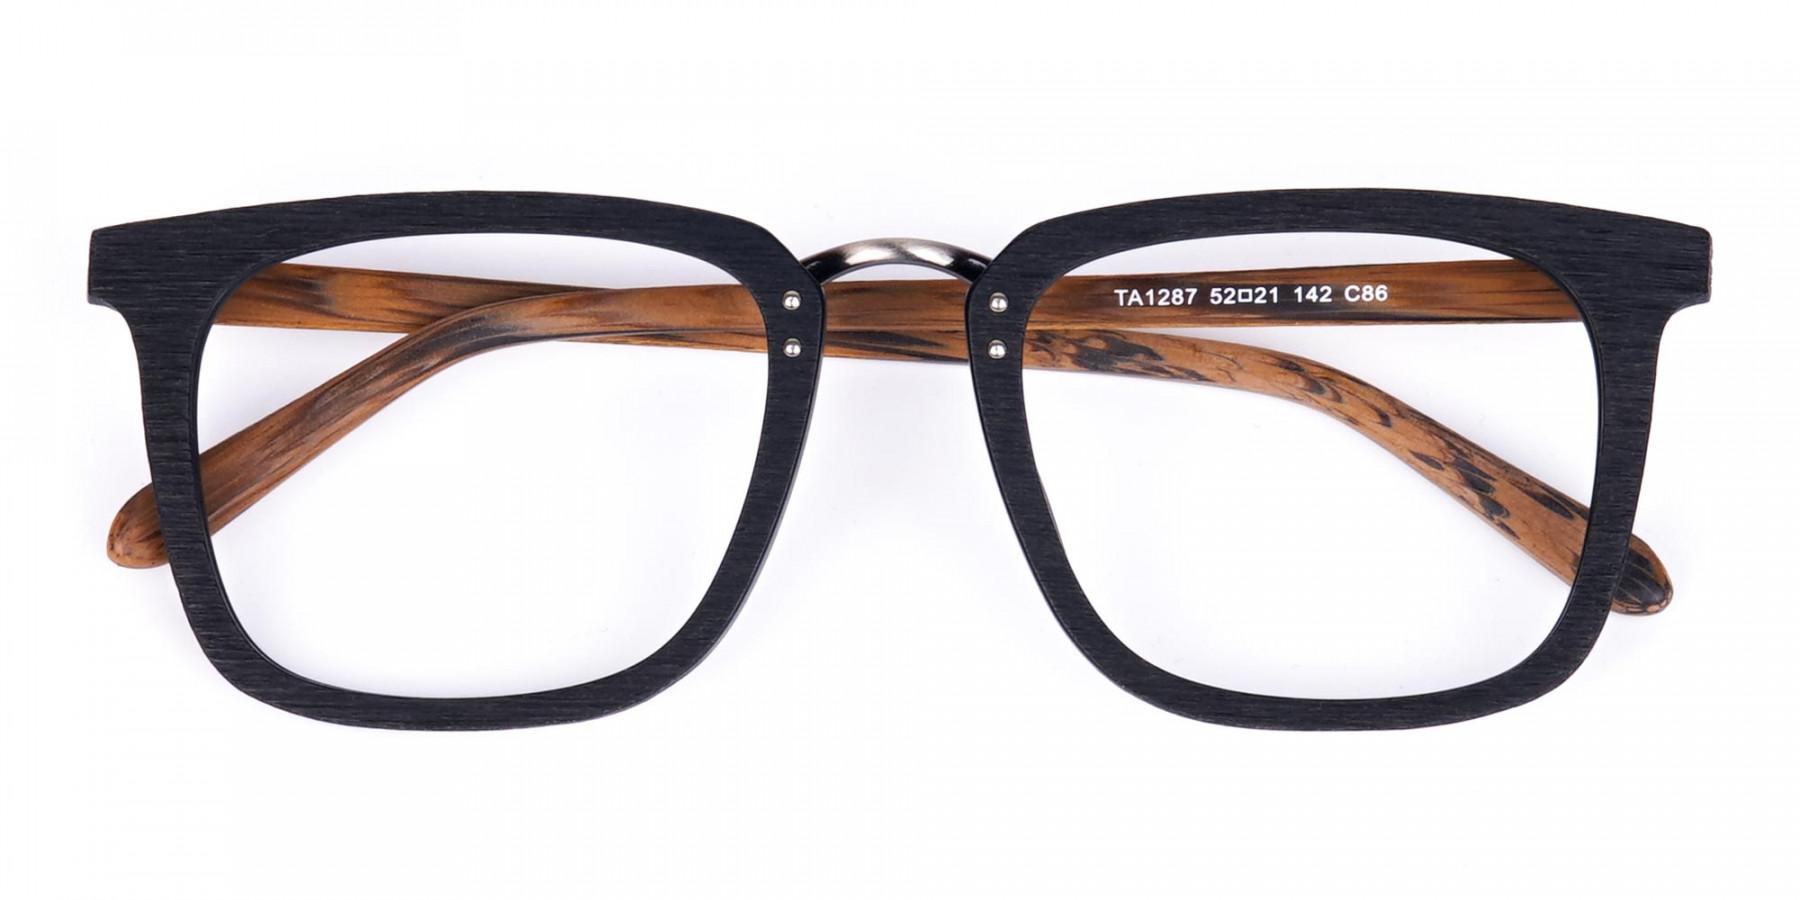 Black-and-Brown-Full-Rim-Wooden-Glasses-1